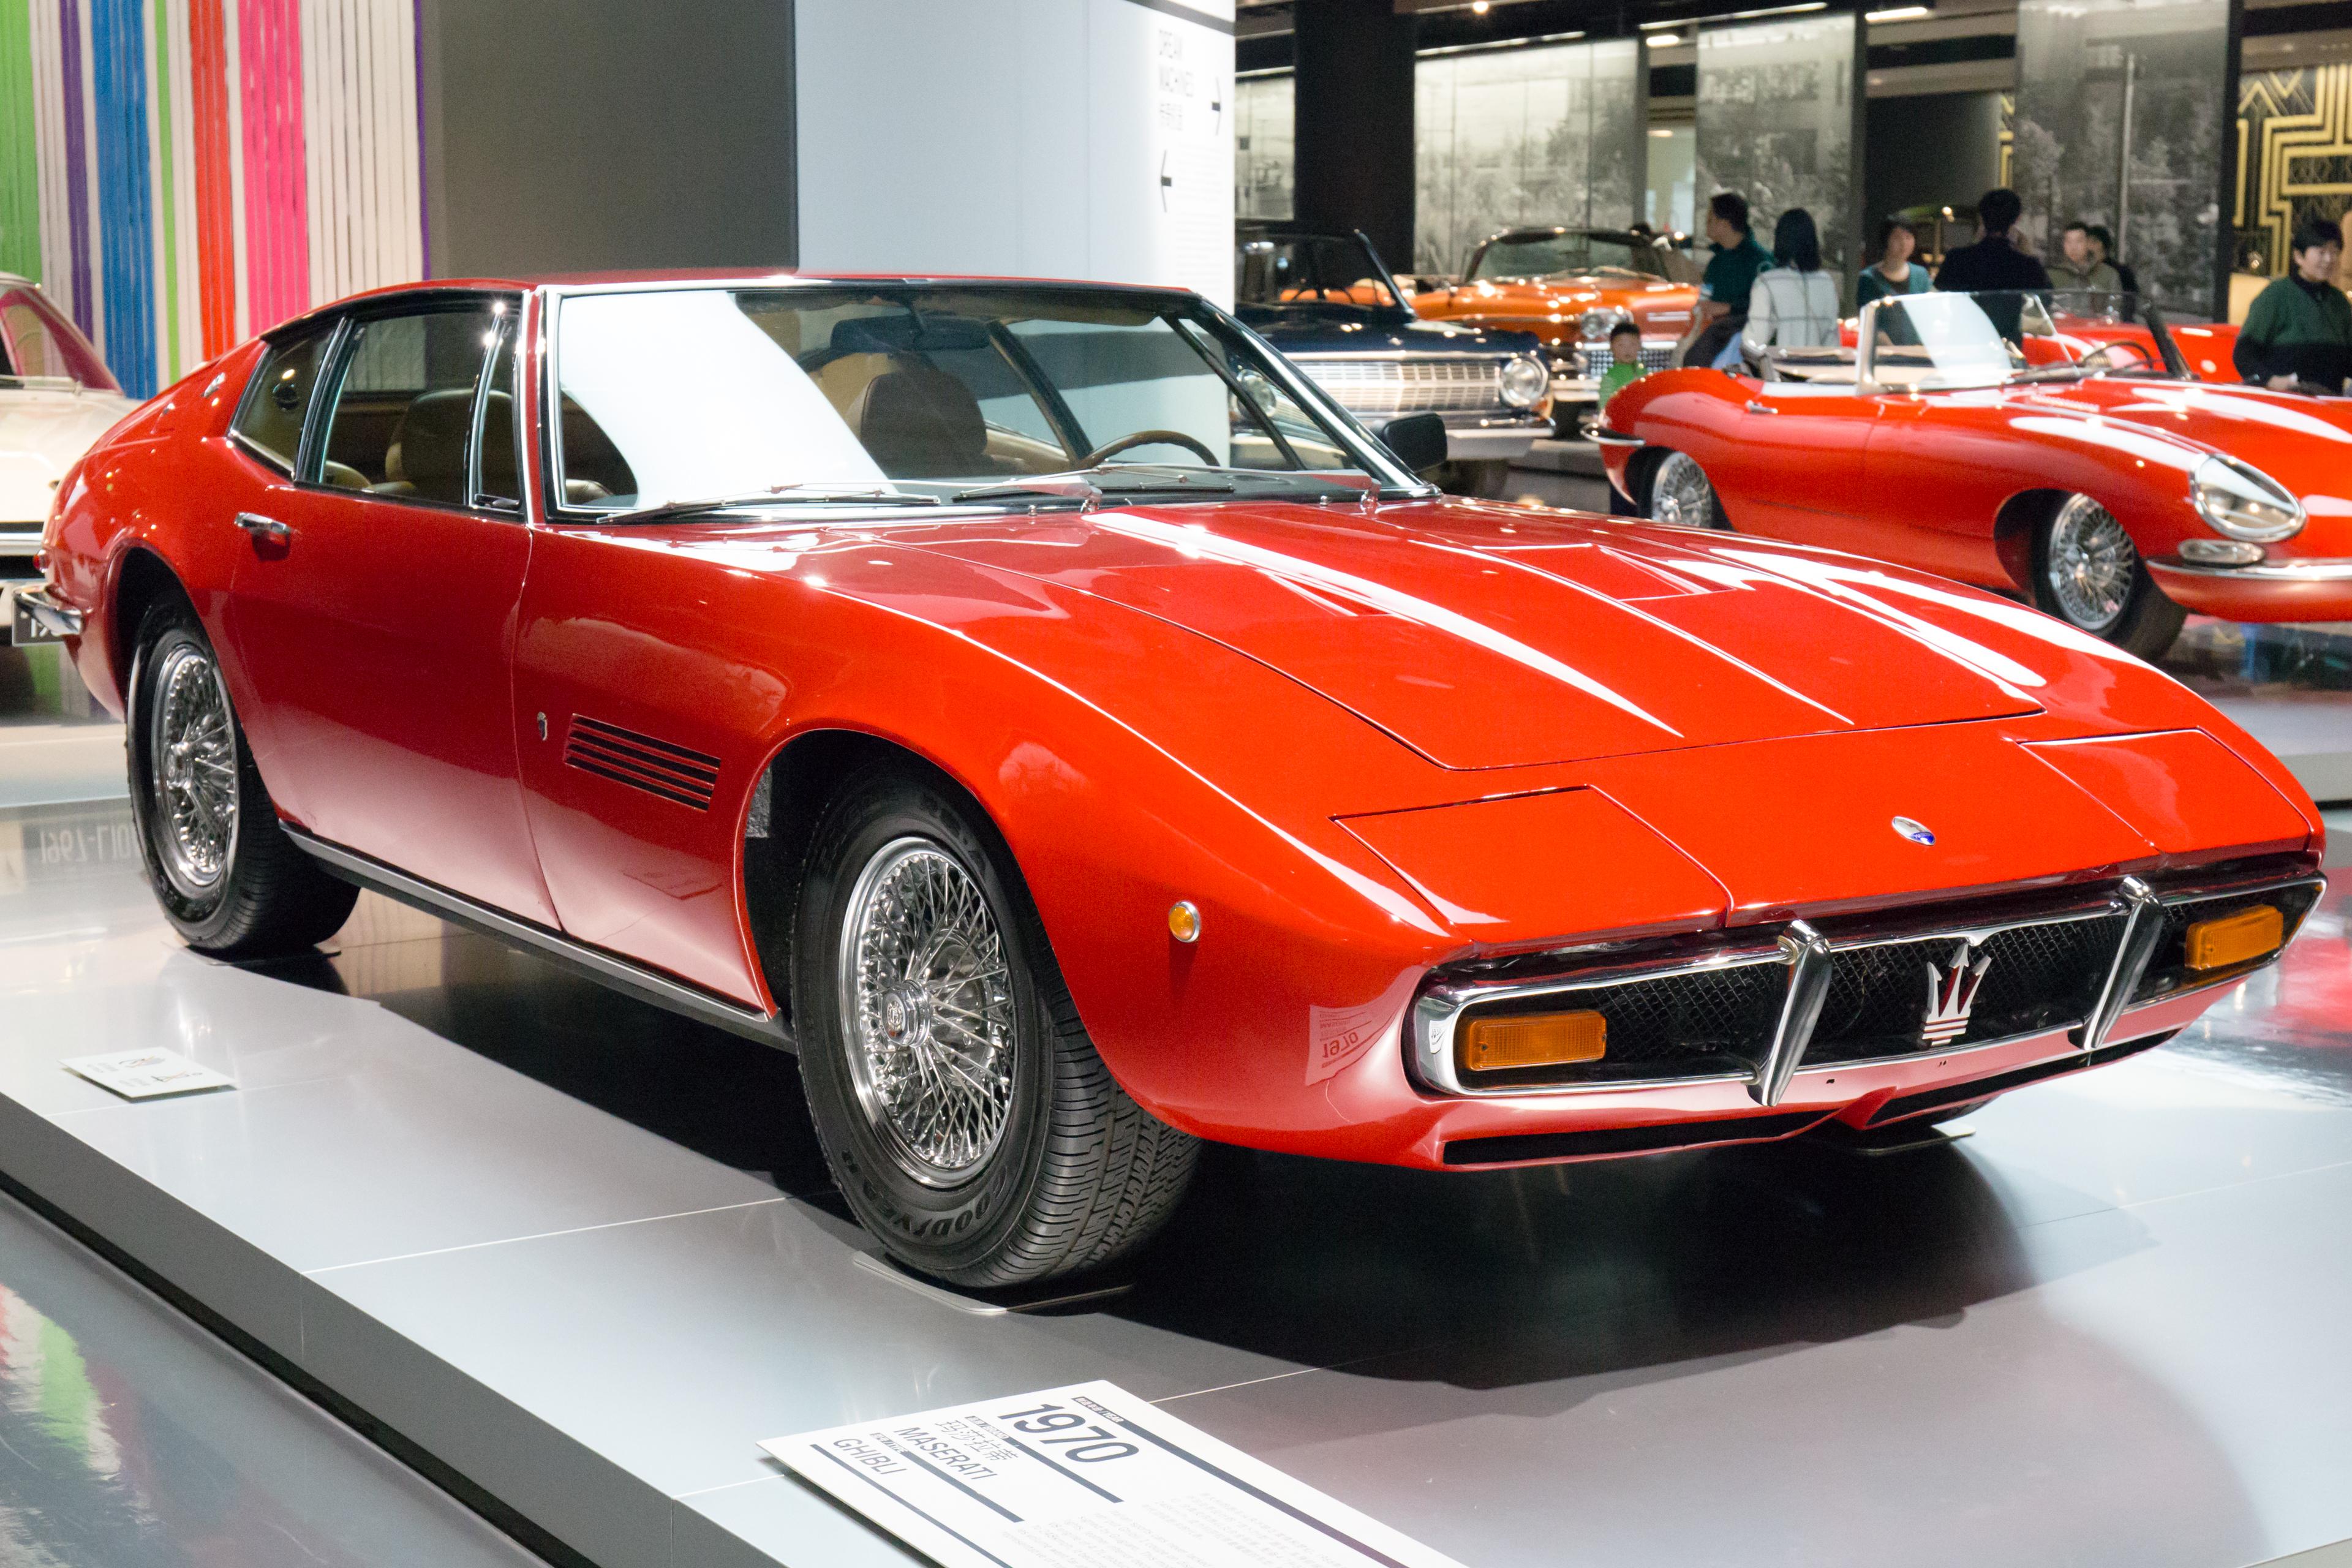 Maserati Ghibli front-right 2016 Shanghai Auto Museum.jpg